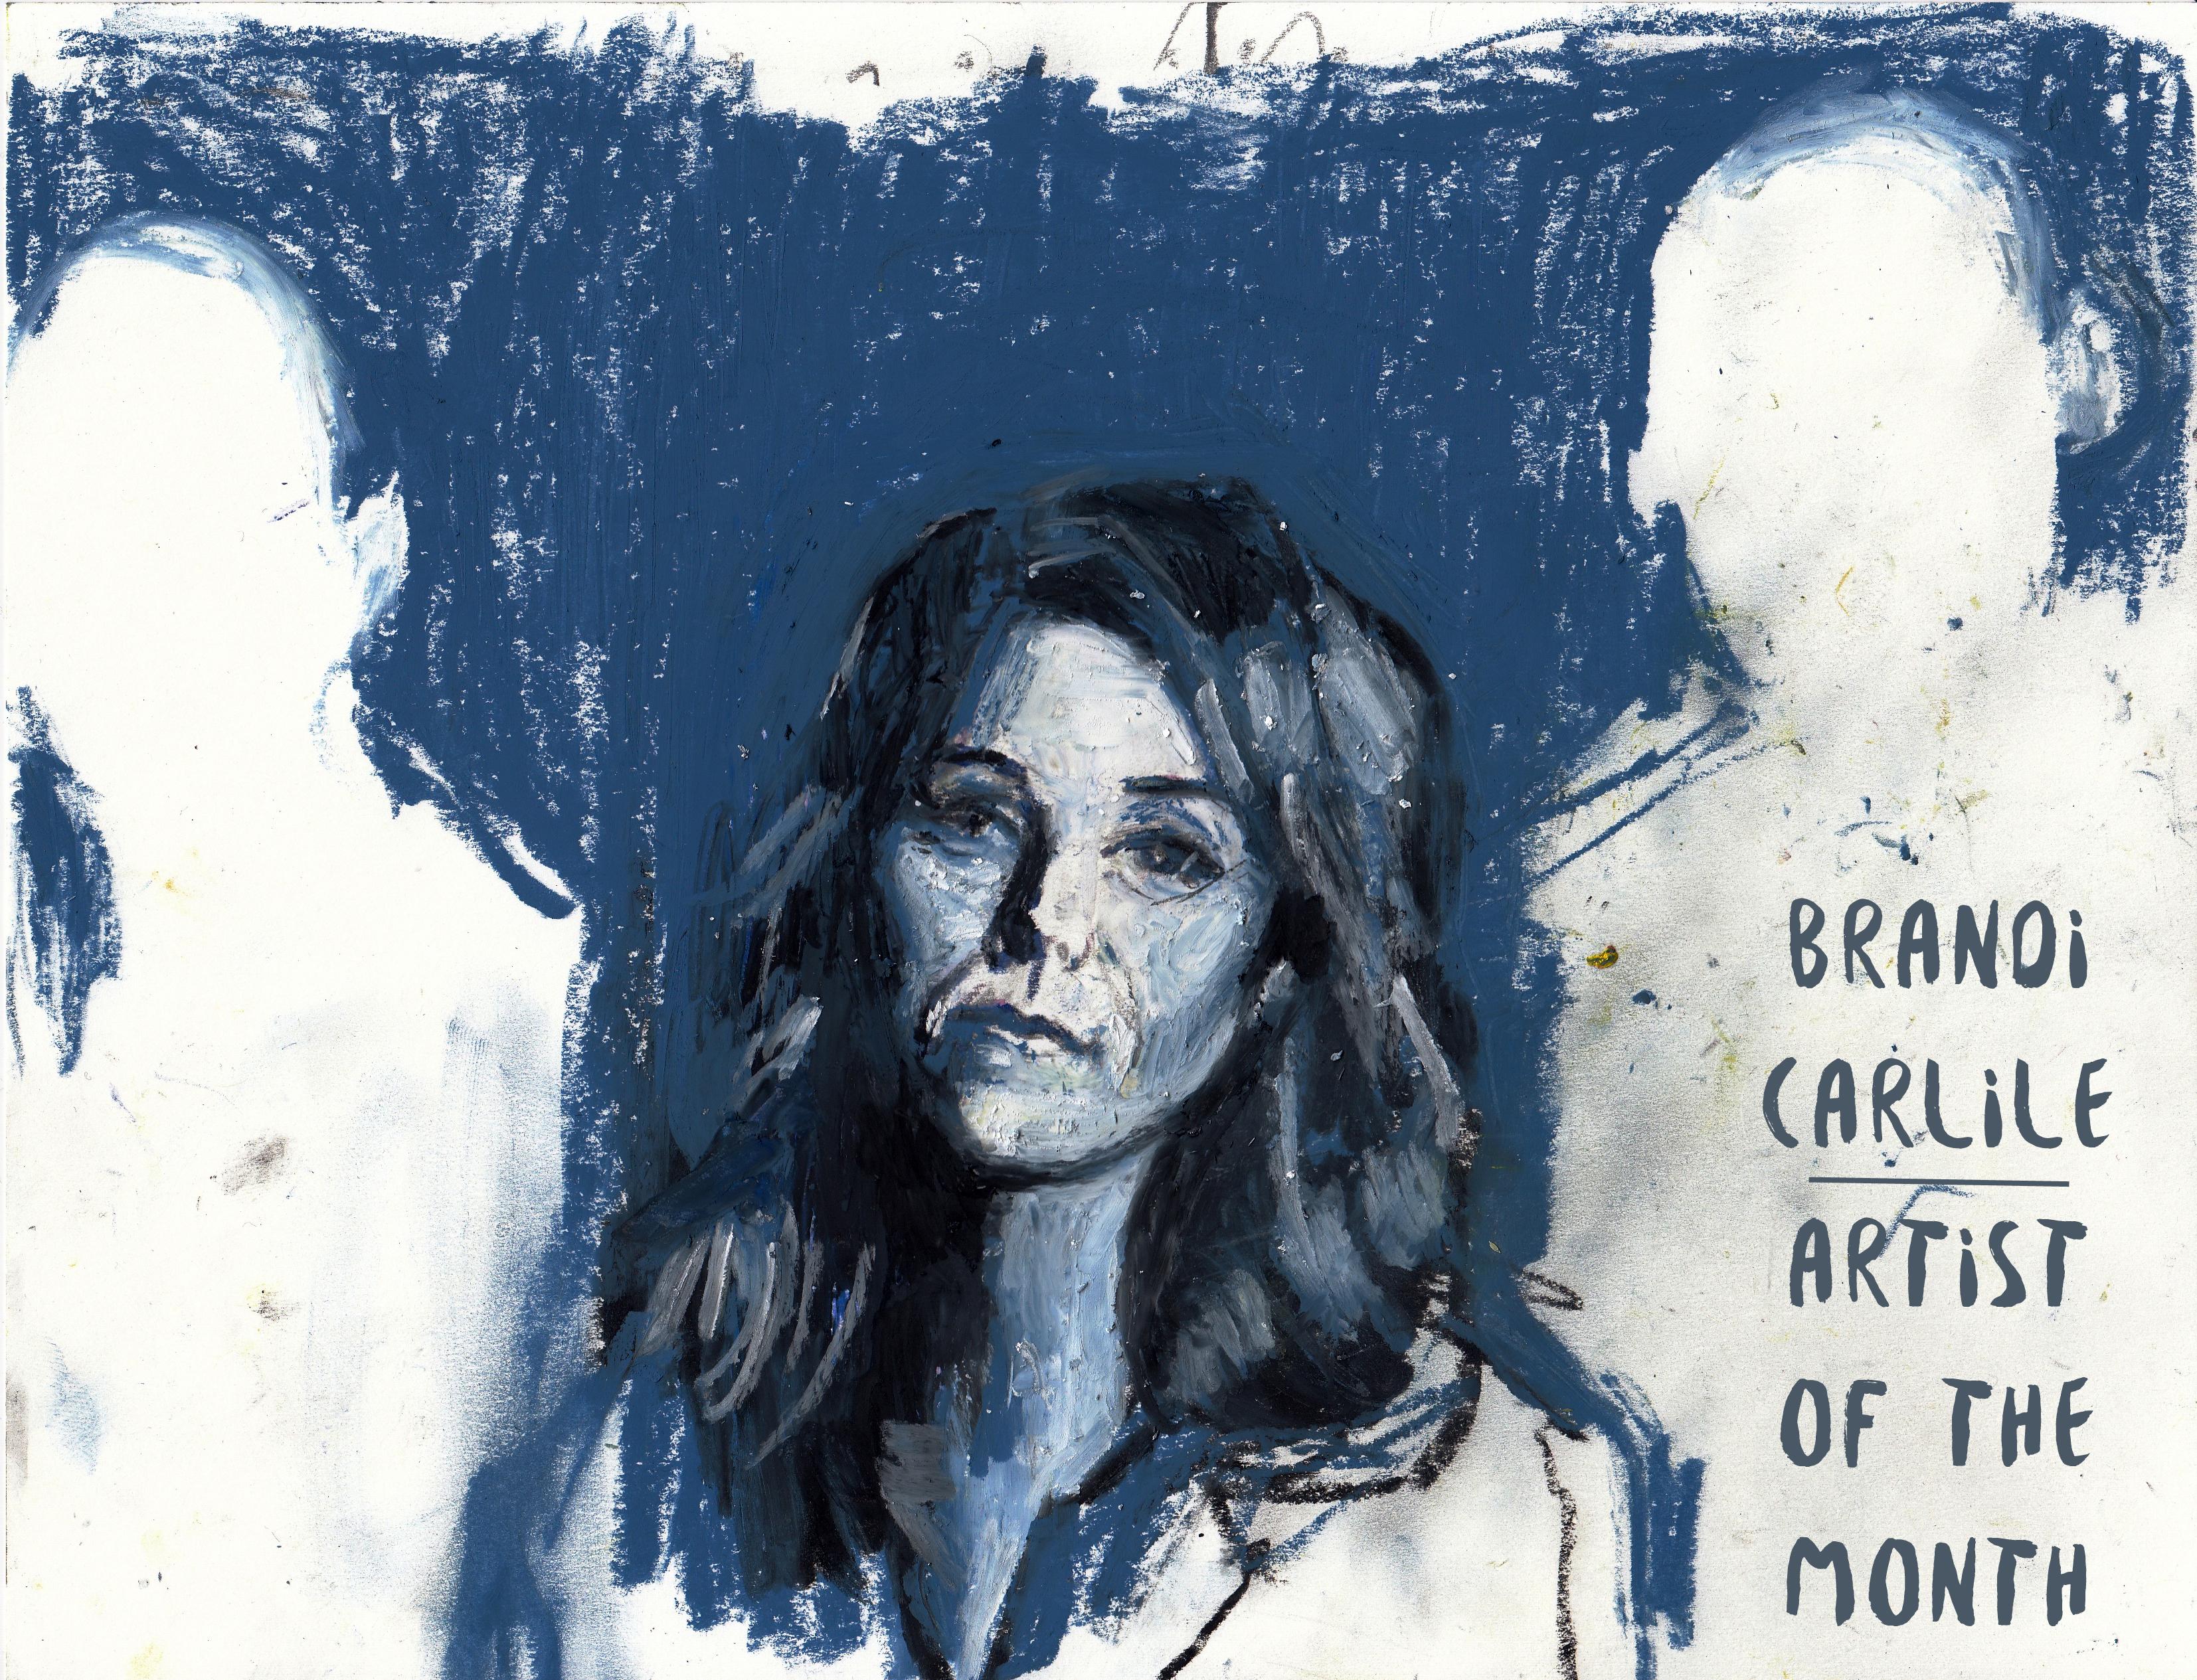 Brandi Carlile: The Work, in Progress